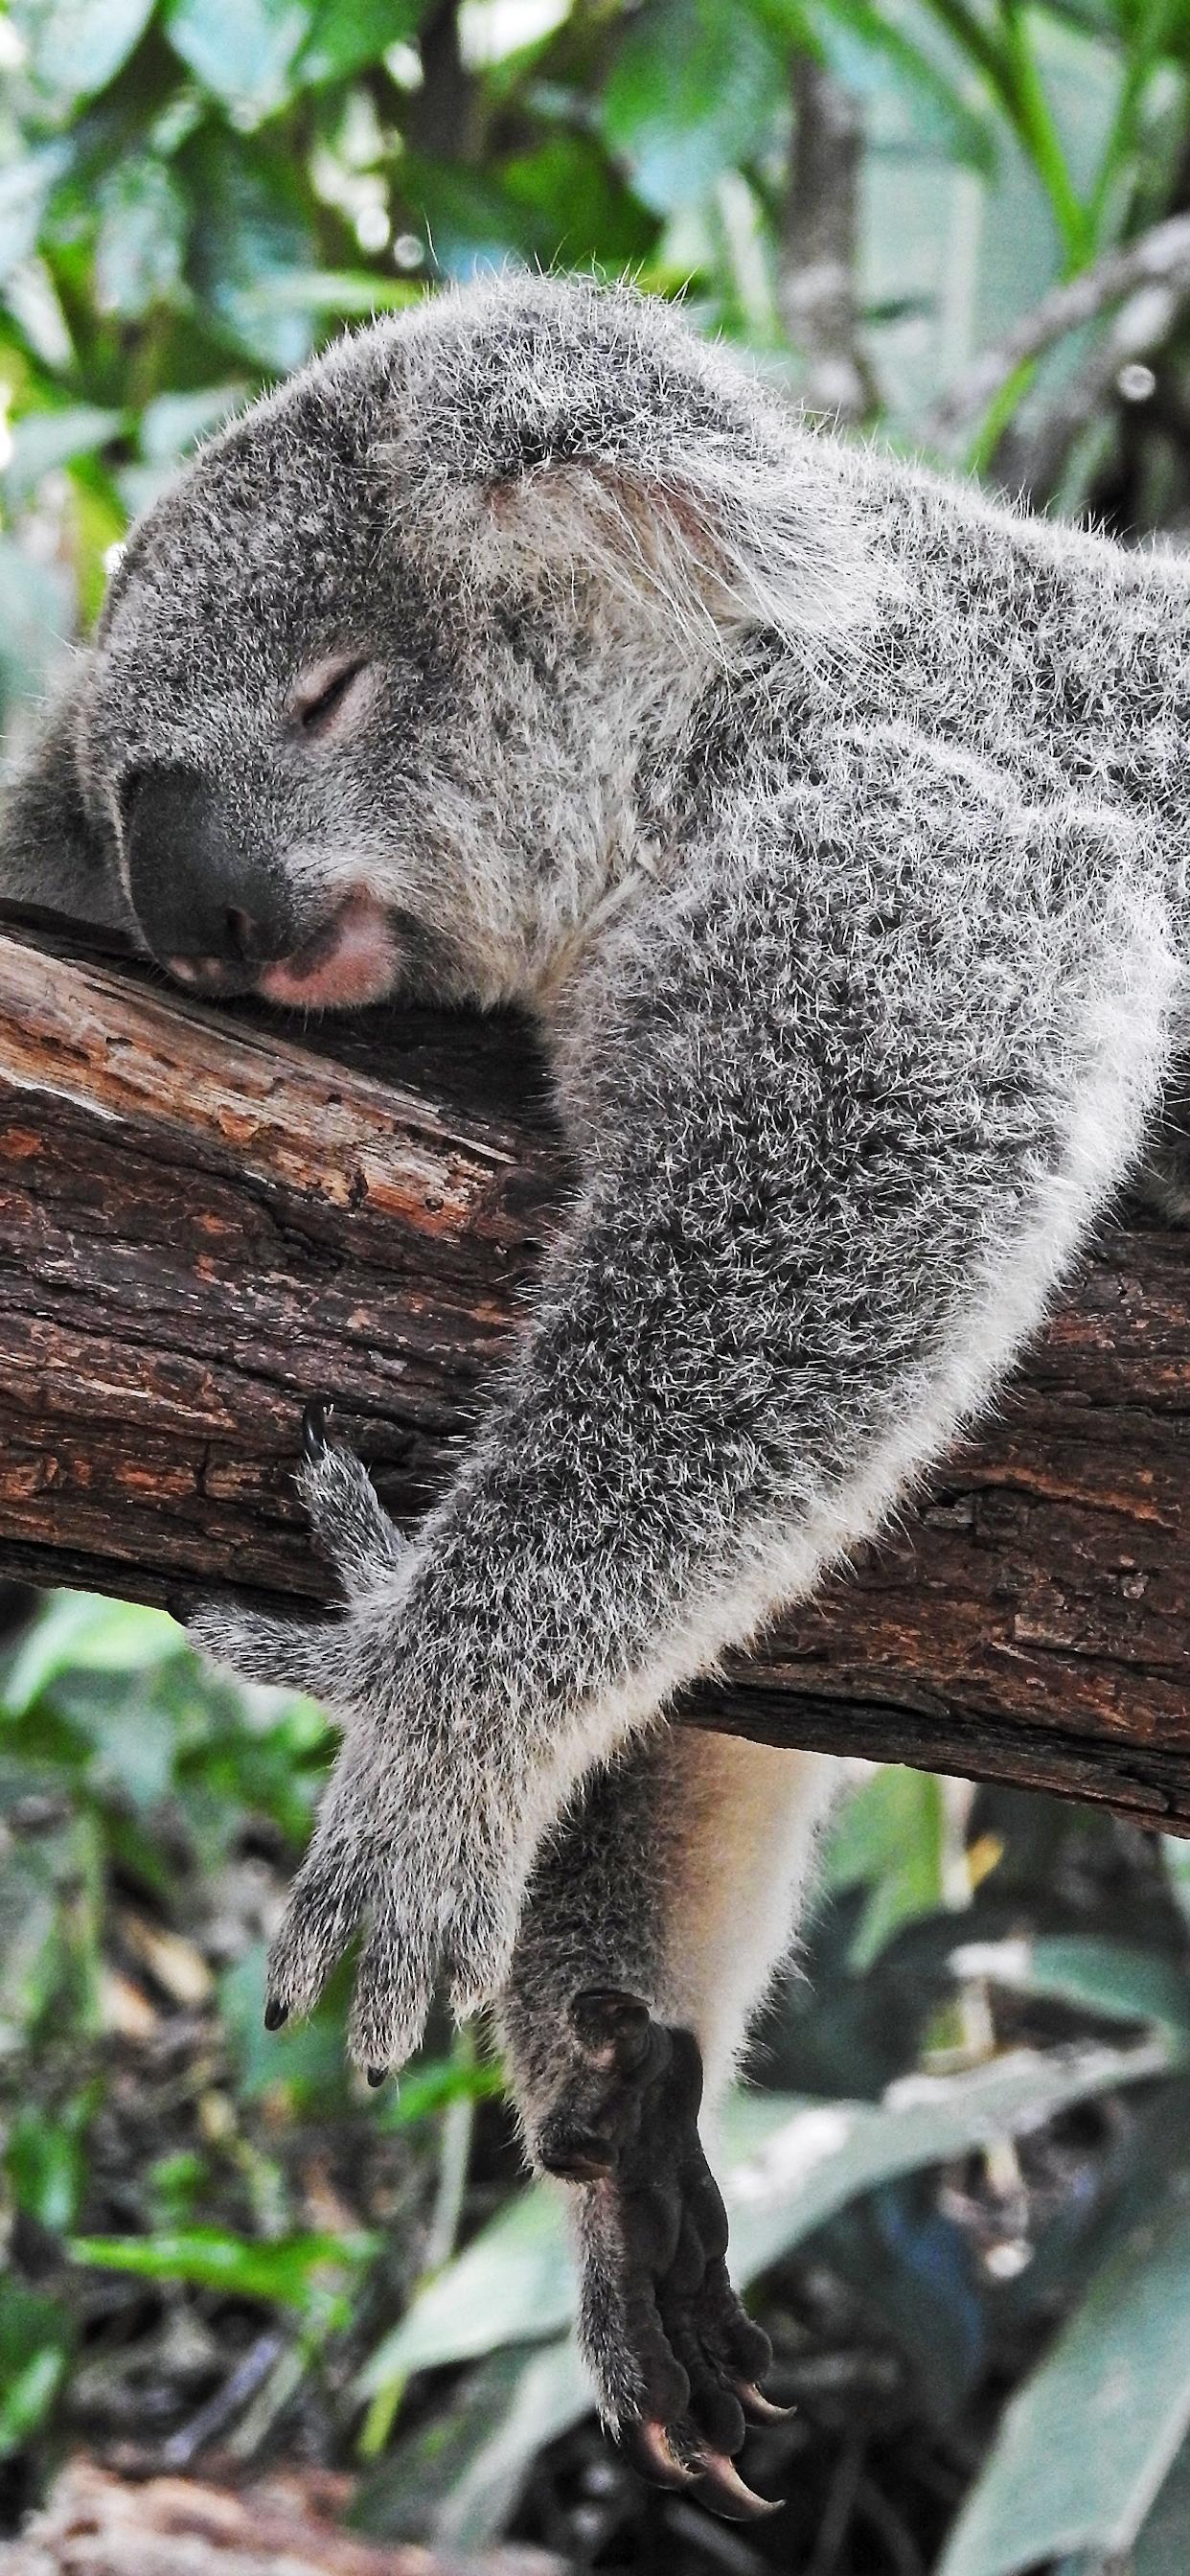 iPhone wallpapers koala kuranda gardens Fonds d'écran iPhone du 12/03/2020